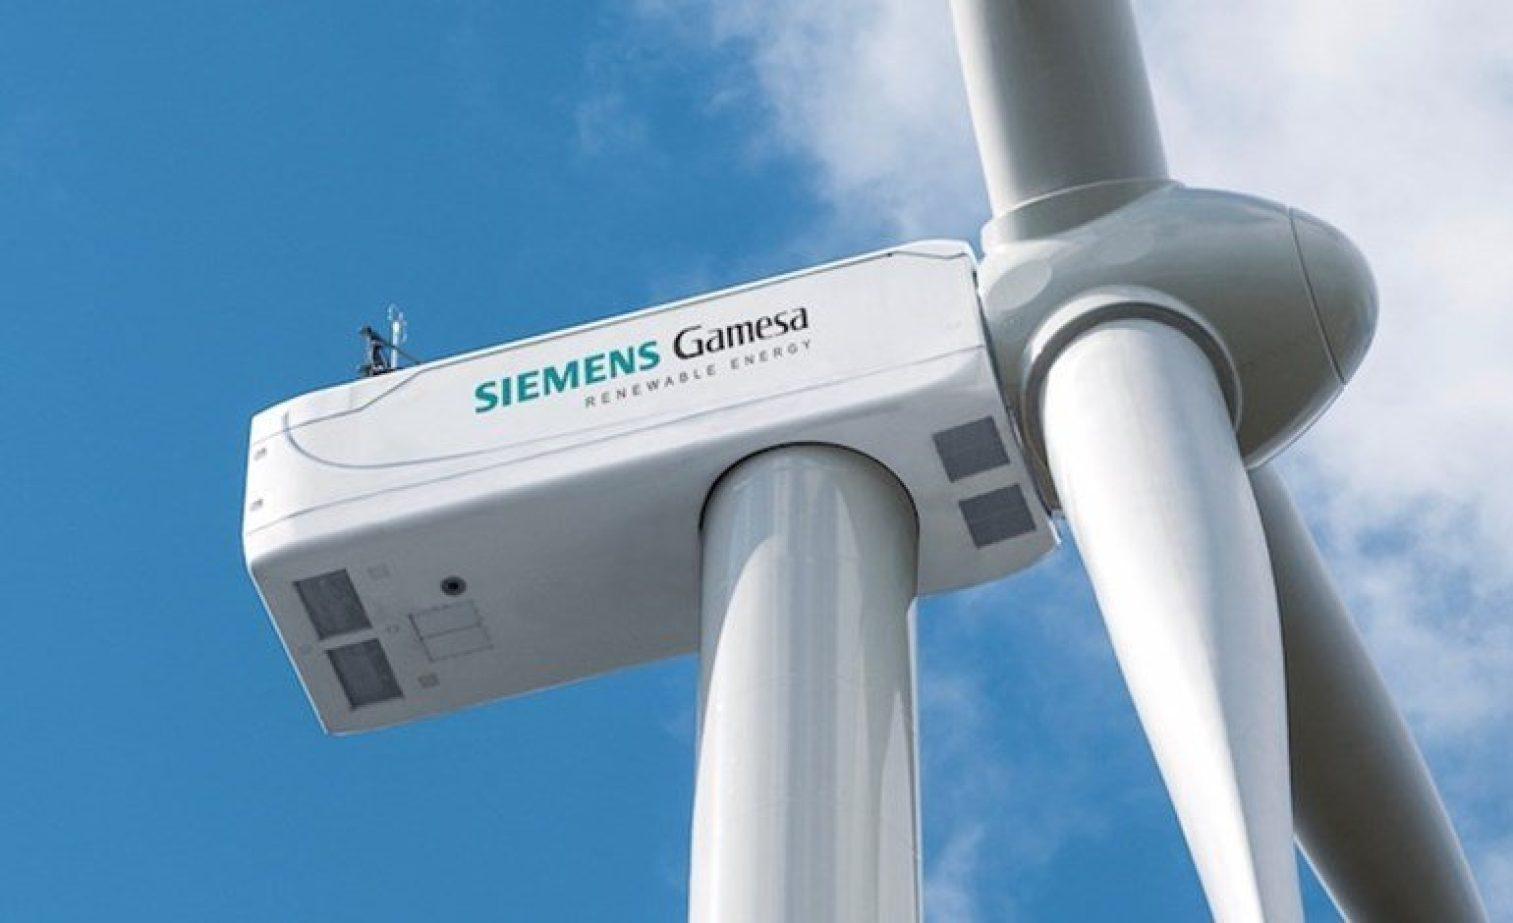 Siemens Gamesa 34 132 Turbine Credit Wpd 1